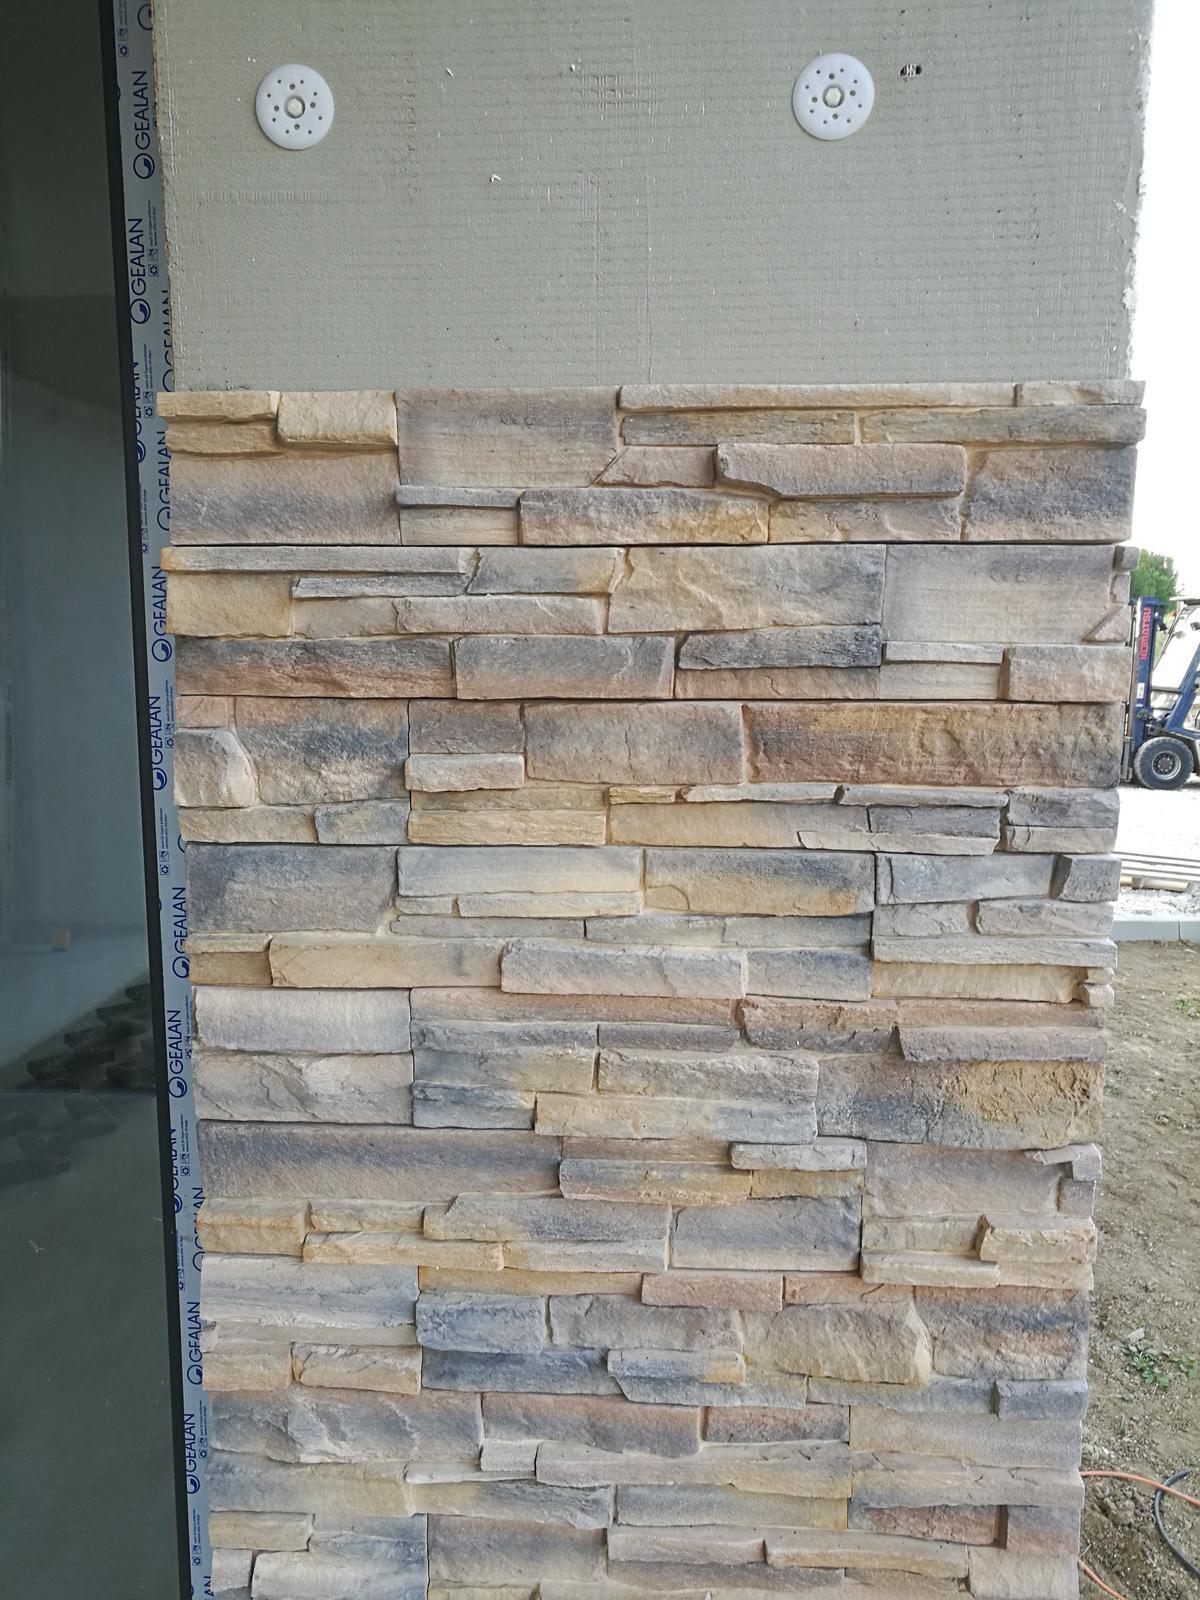 tehlové a  kamenné obklady  - REALIZACIE - obklad Grenada 2, CC 35 Eur/m2, zlavy  poskytujeme až do výšky 15 %